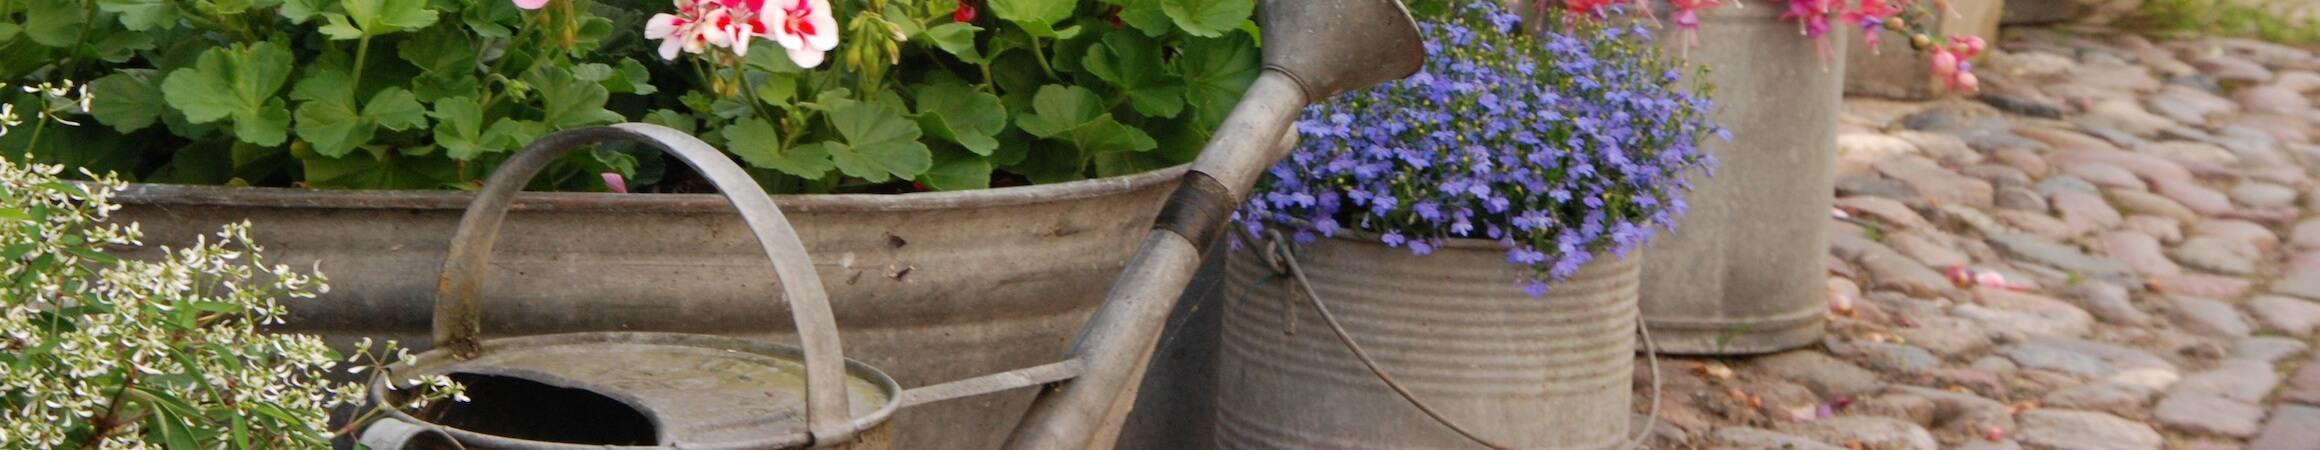 Gardening 07